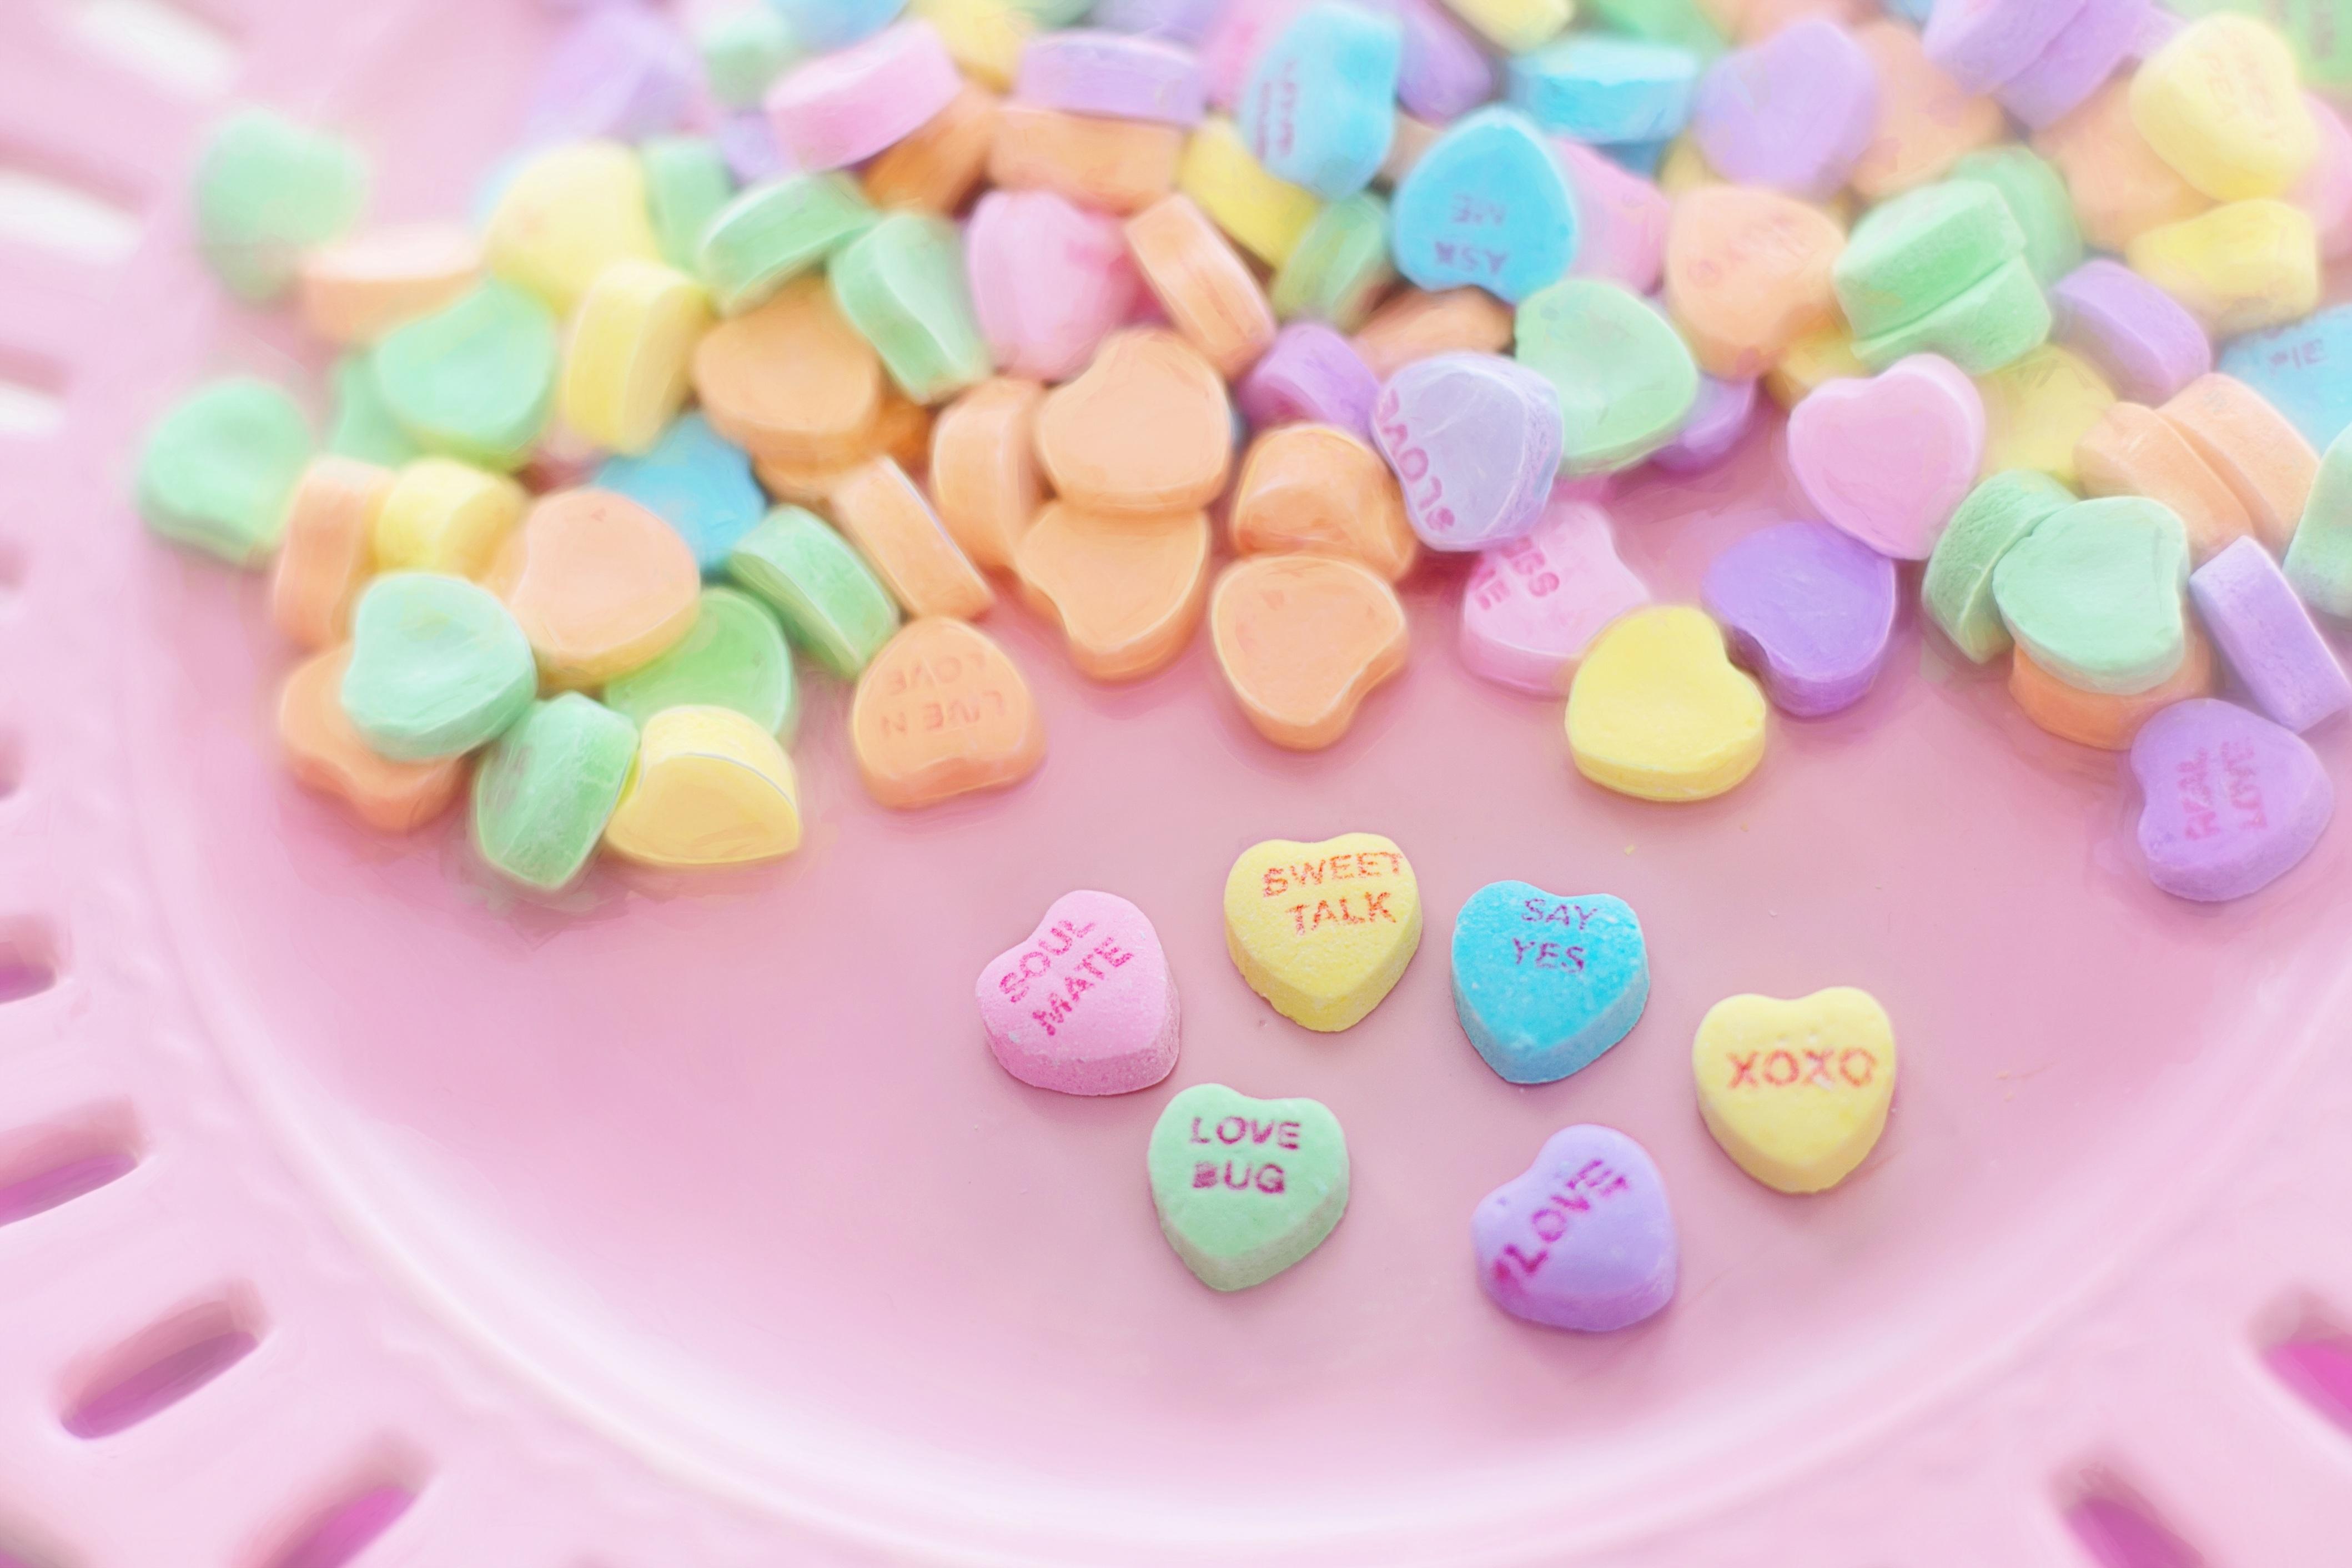 Free Images : sweet, petal, food, color, holiday, pink, dessert ...